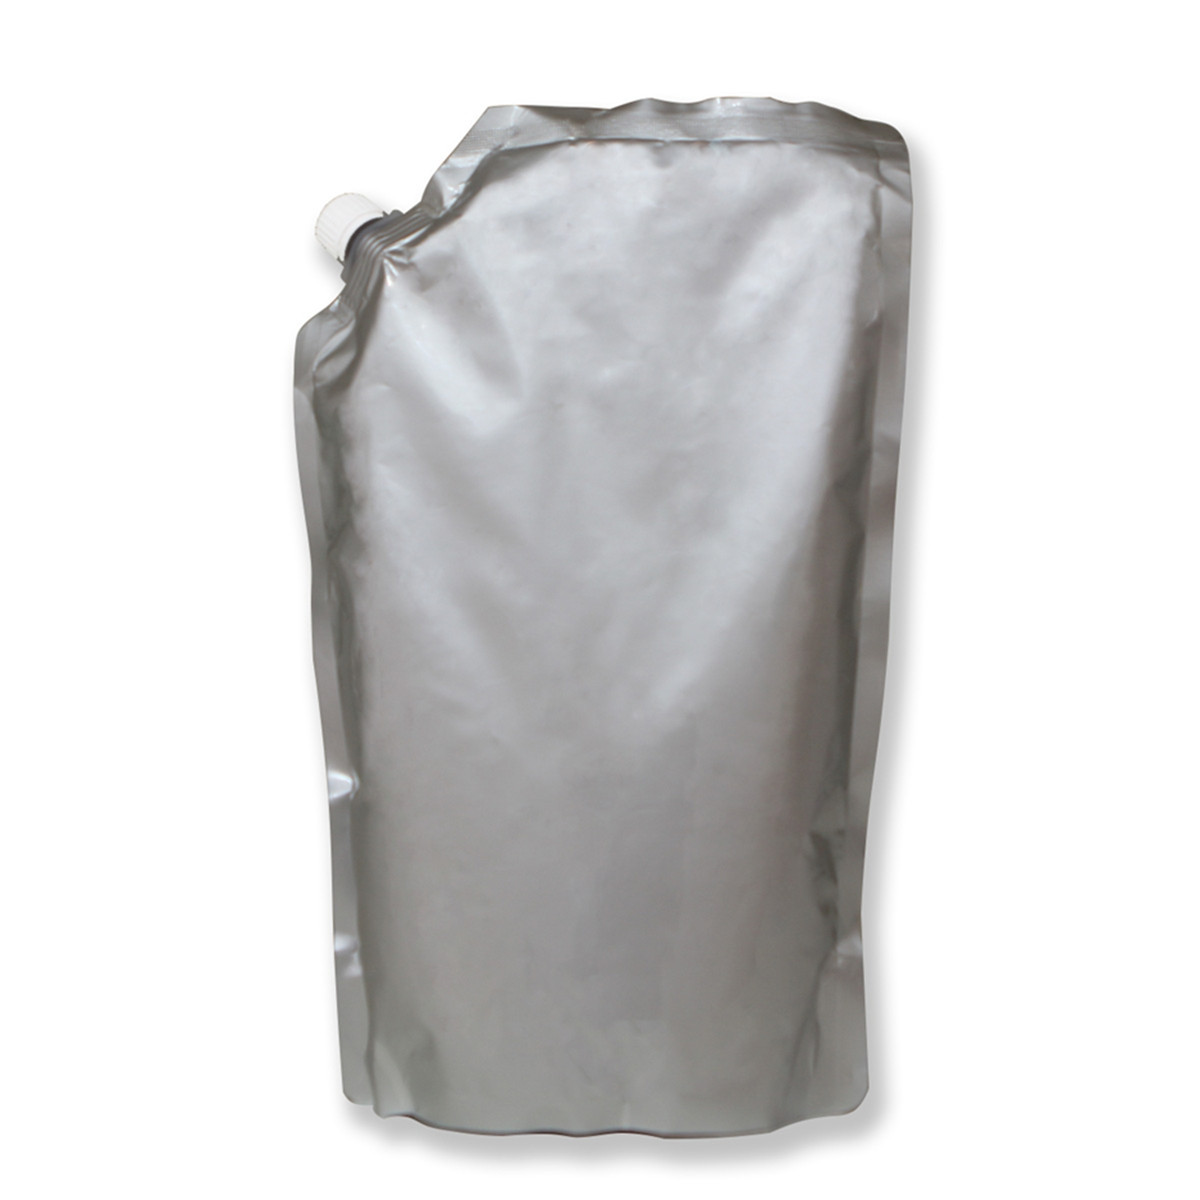 Toner Refil HP Q1338A 1338A | 4200 4200N 4200TN 4200DTN 4200DTNS 4200DTNSL | Jadi 1kg